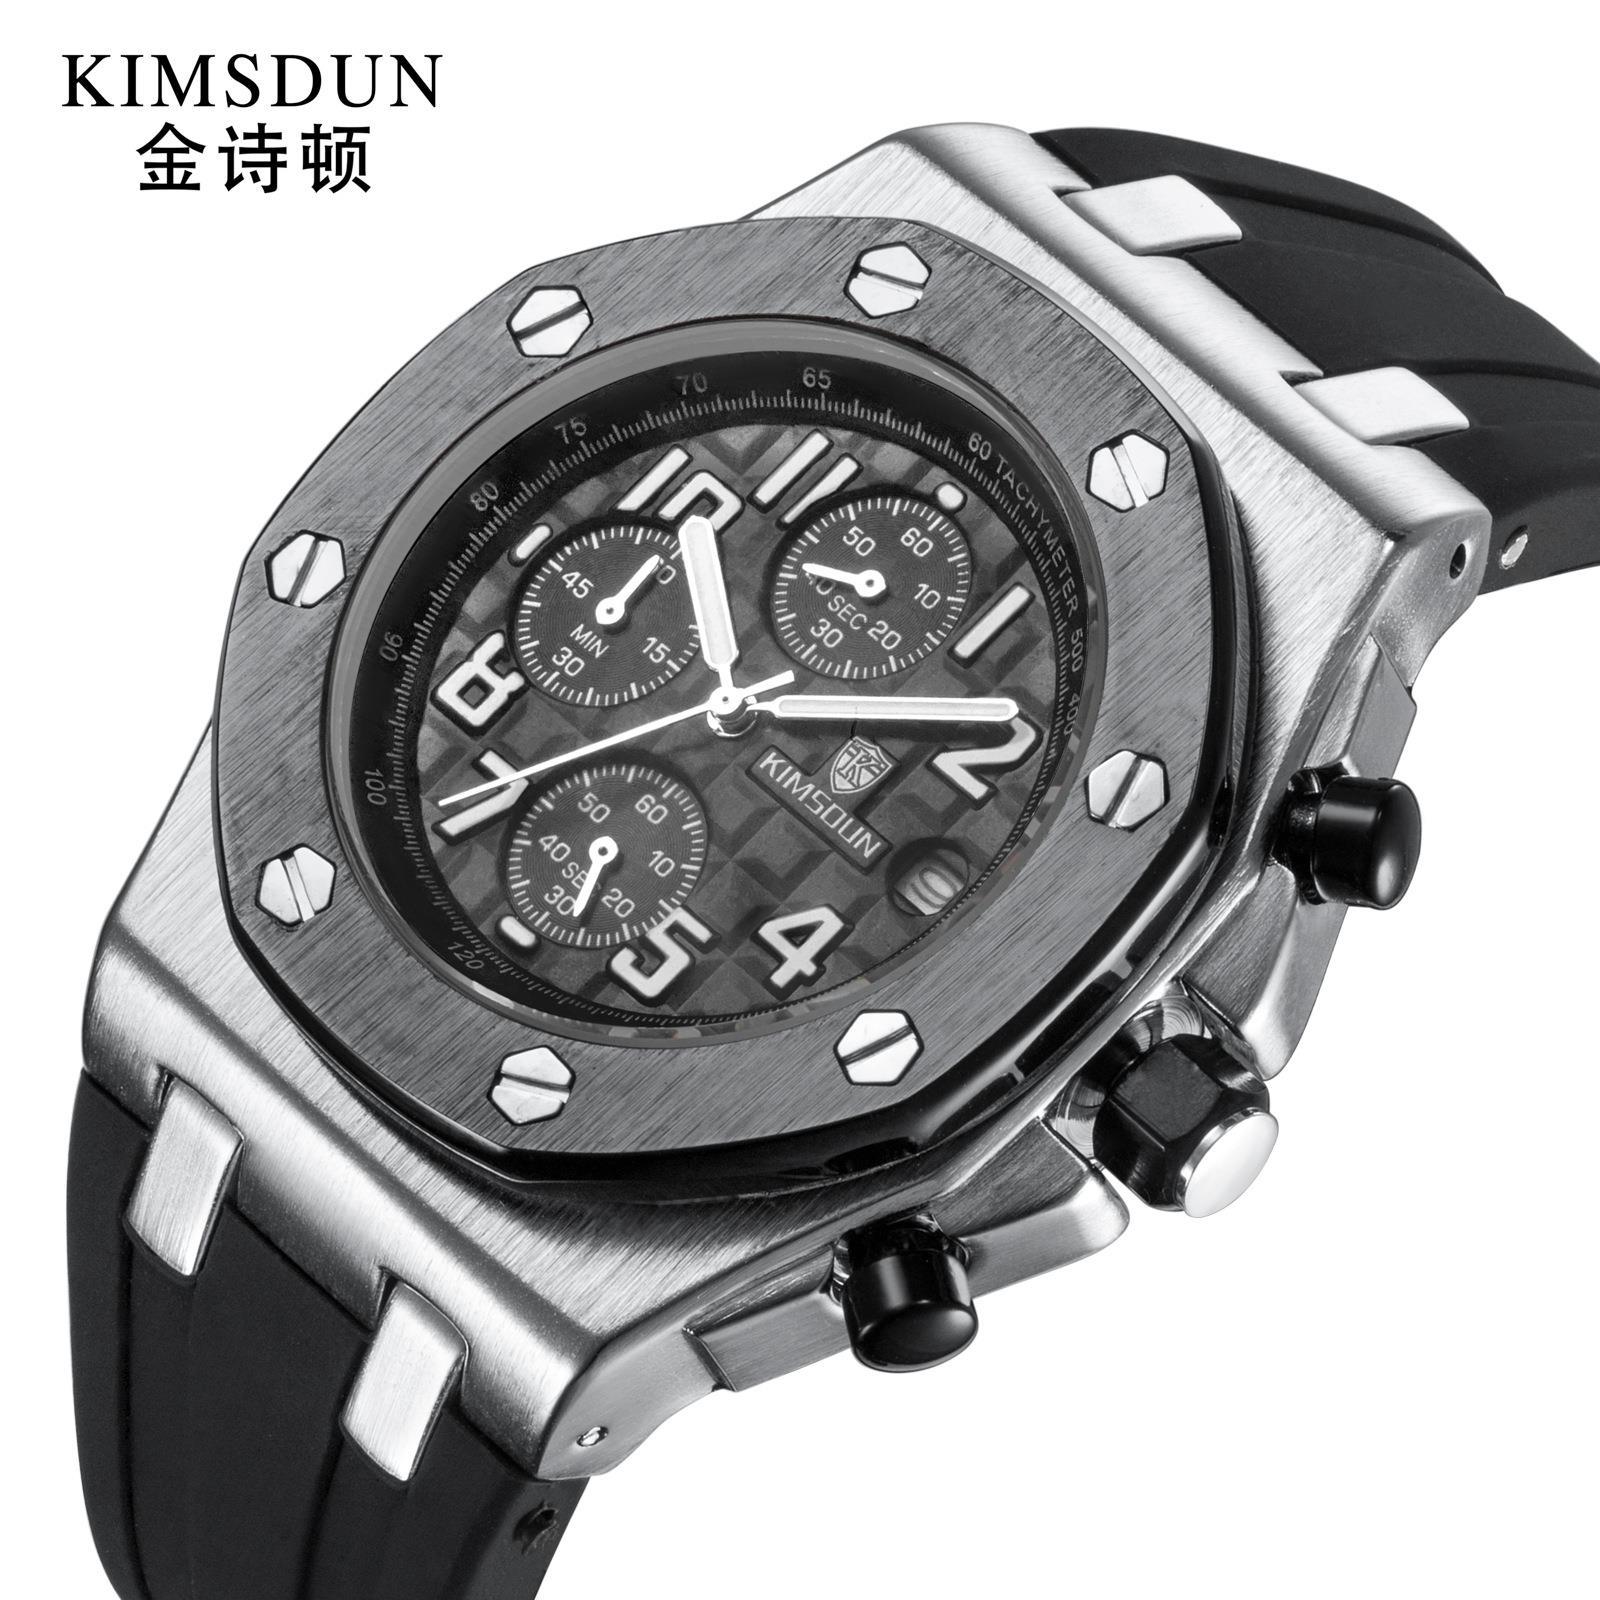 AP Royal Oak Offshore mens watch silicone tape three eye waterproof multifunctional leisure large dial quartz watch